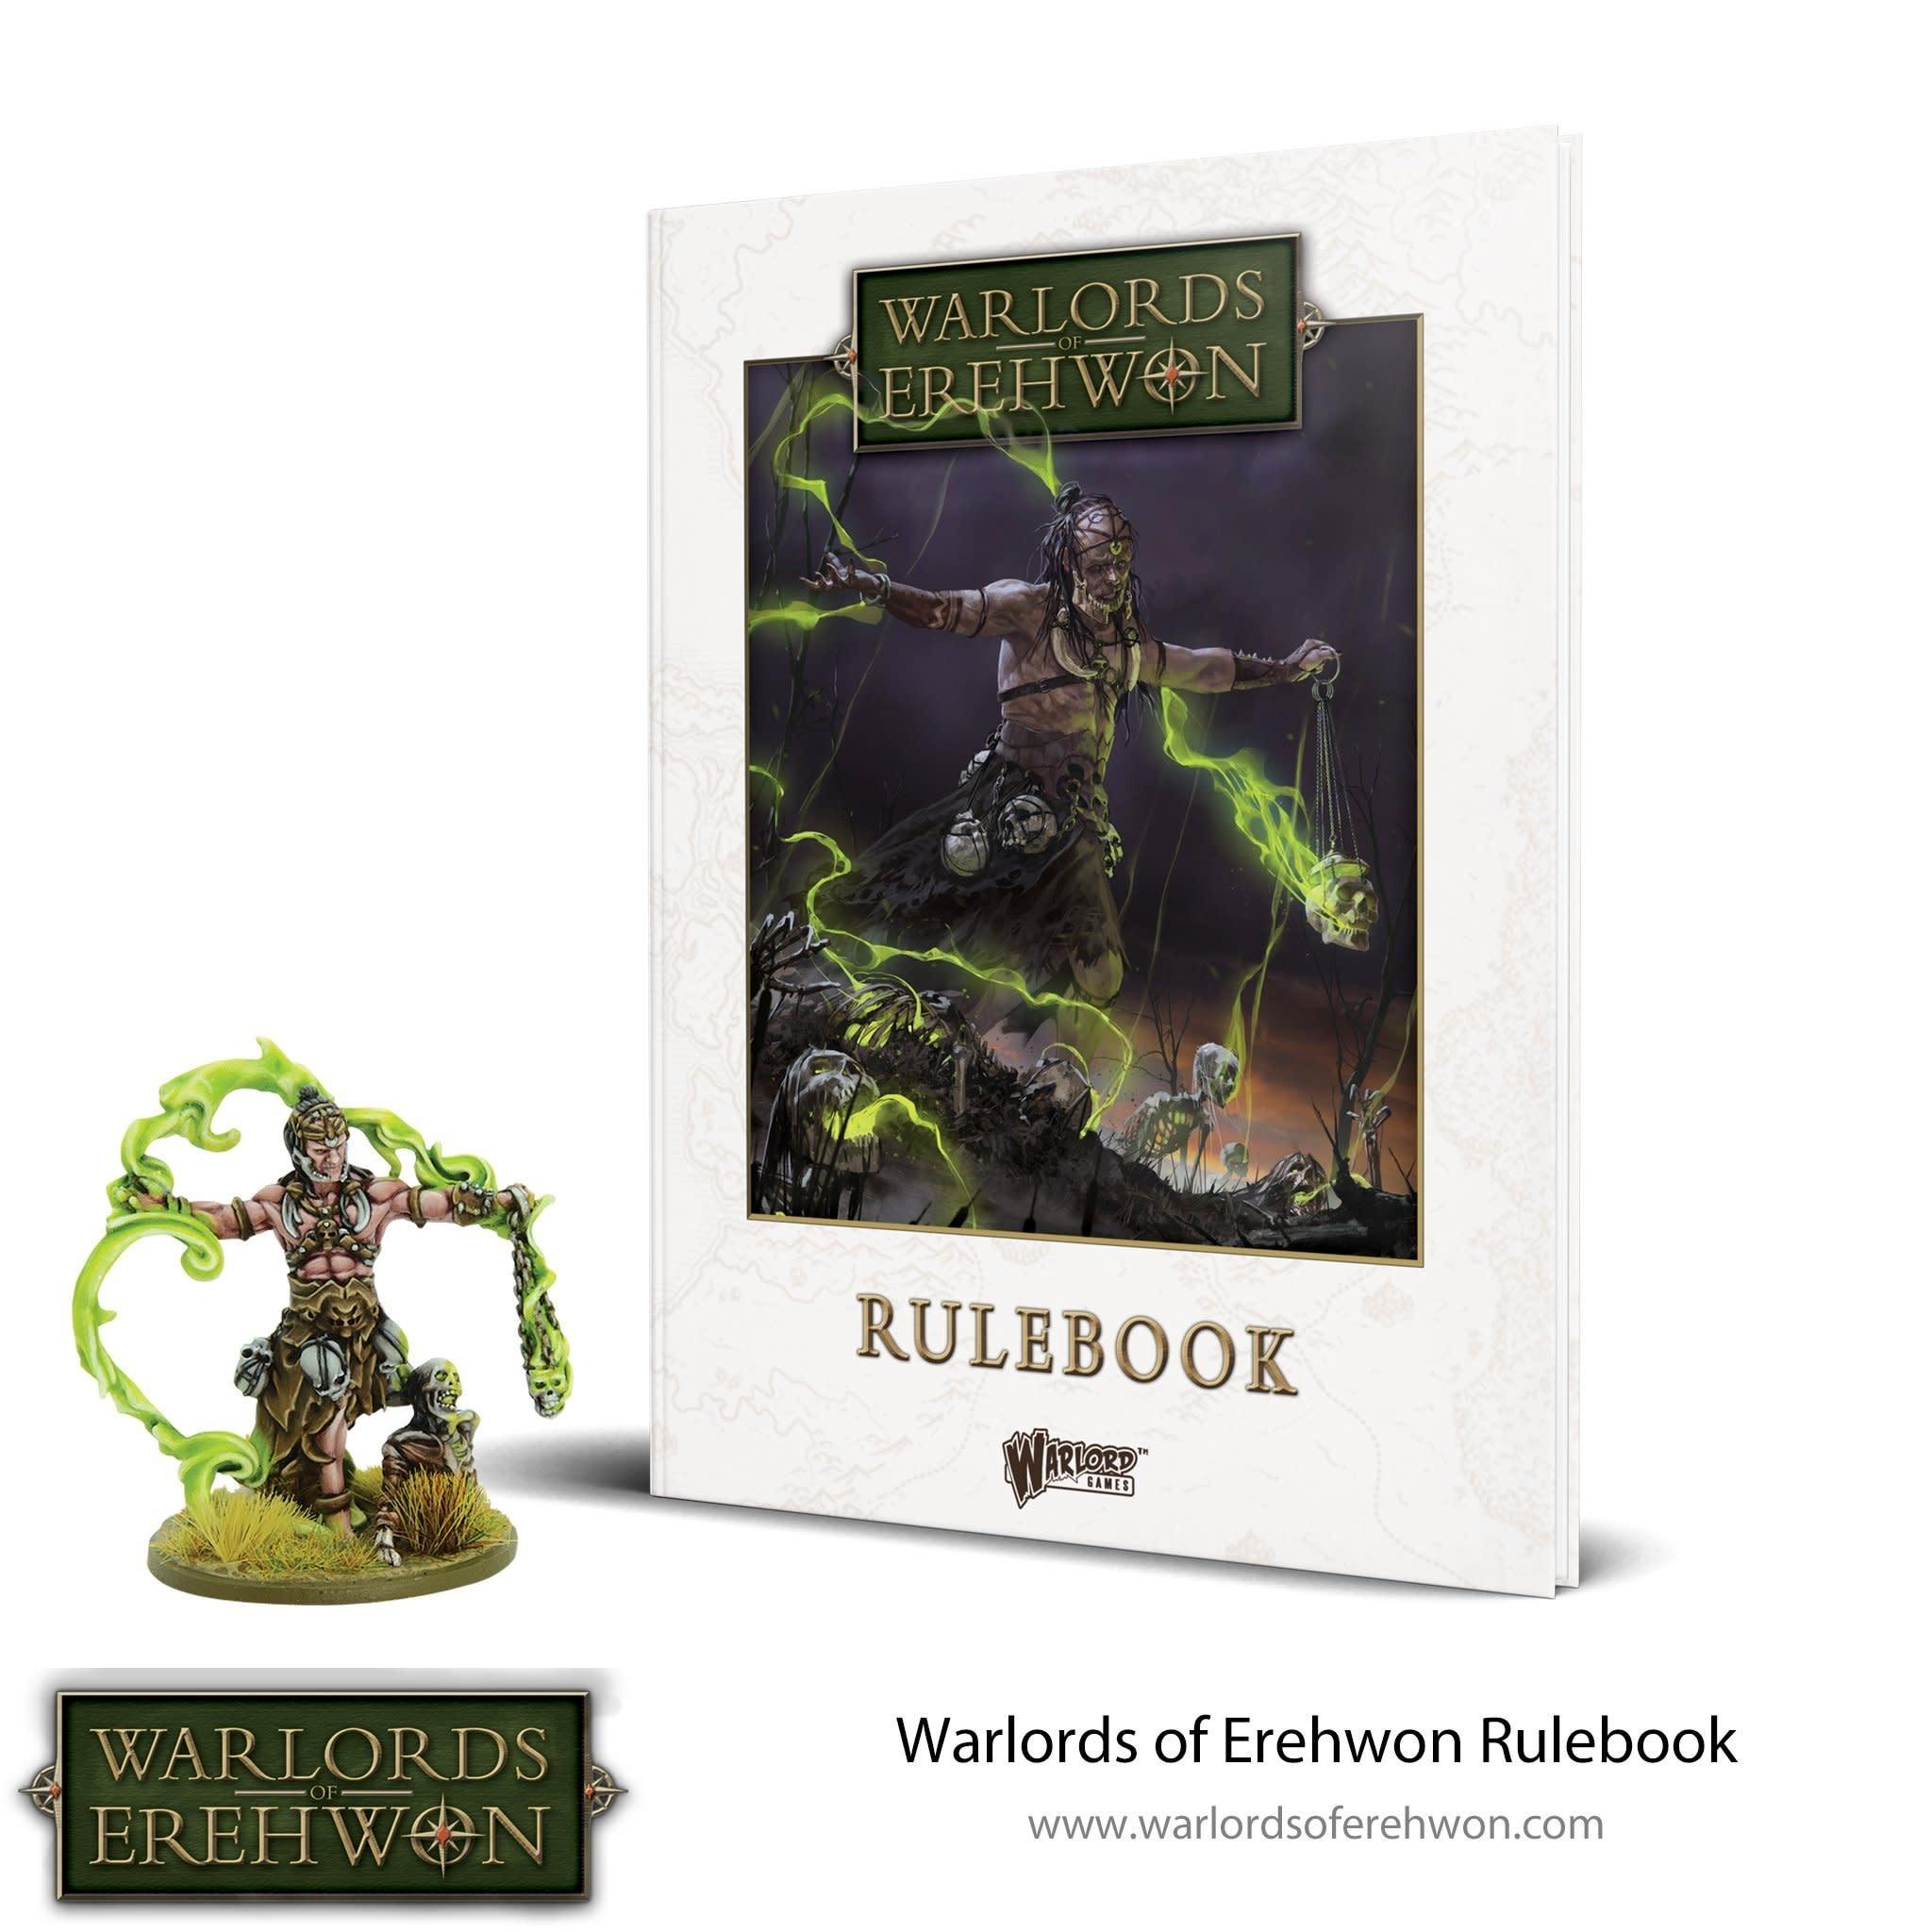 Warlord games Warlords of Erehwon: Rulebook